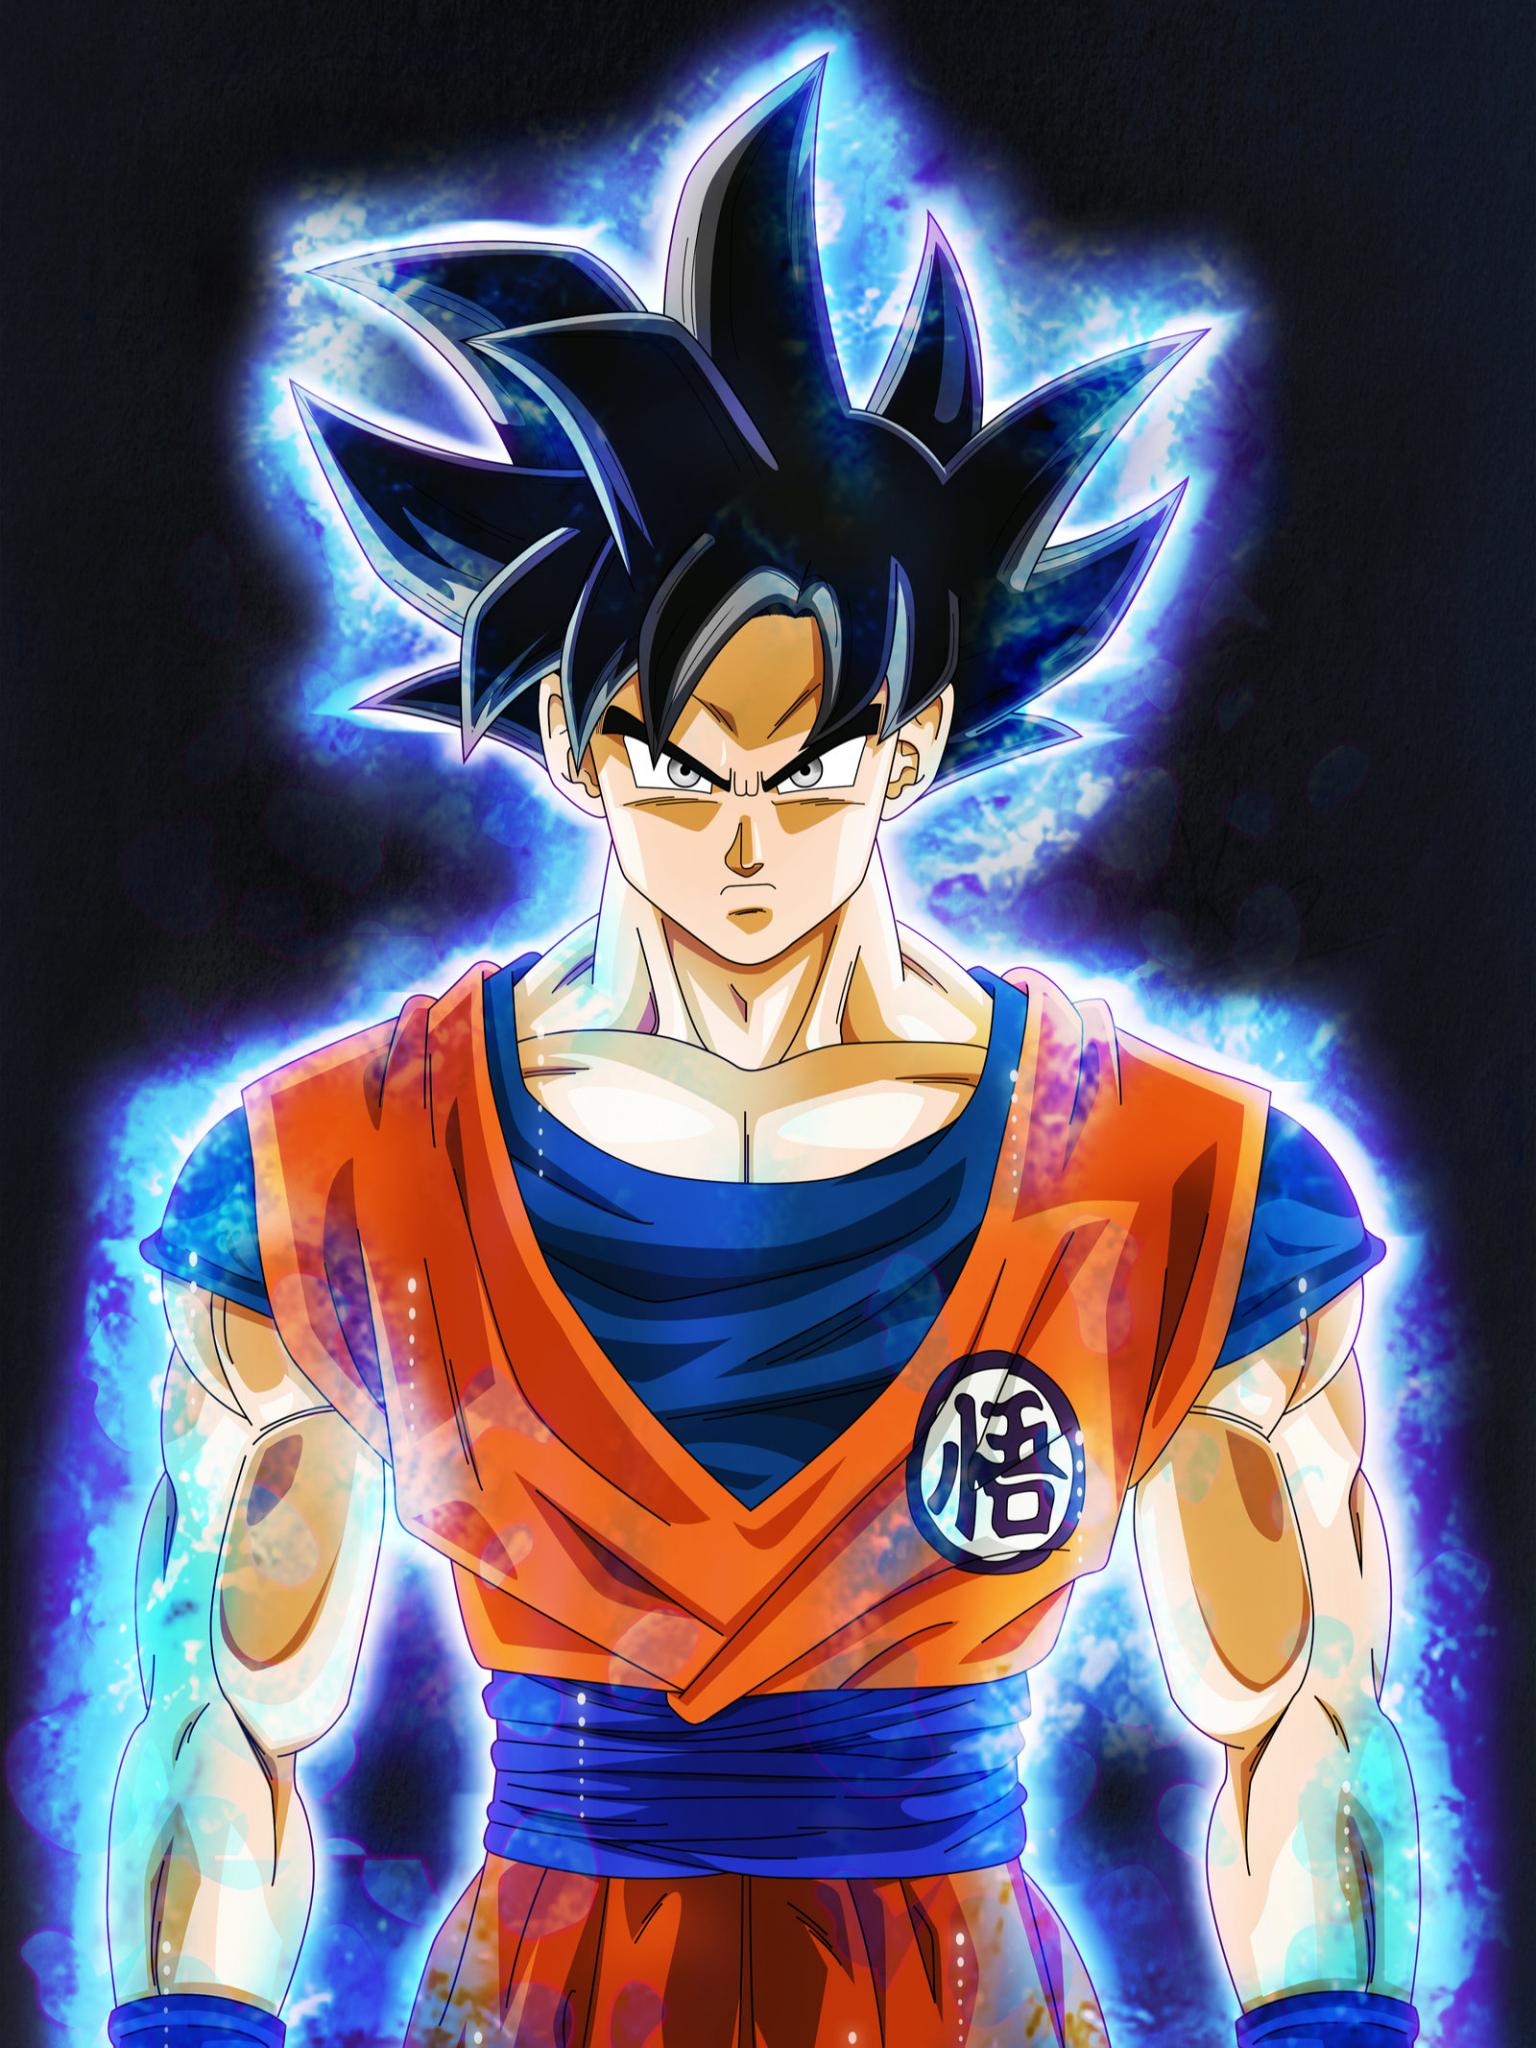 Free Download Dbs Ultra Instinct Goku Wallpaper Wallskid